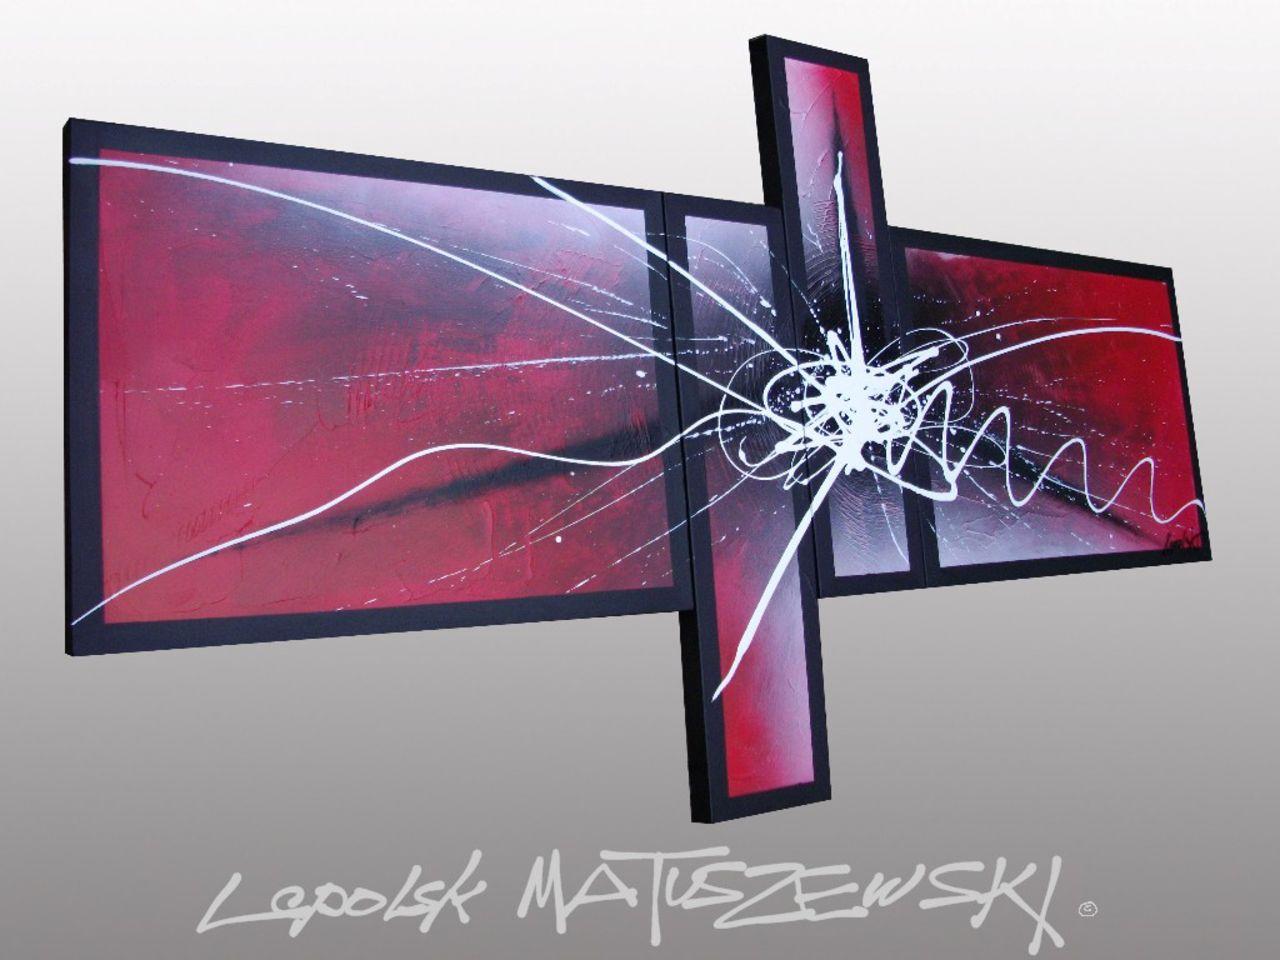 MISTER K  (Lepolsk Matuszewski) TRYADES